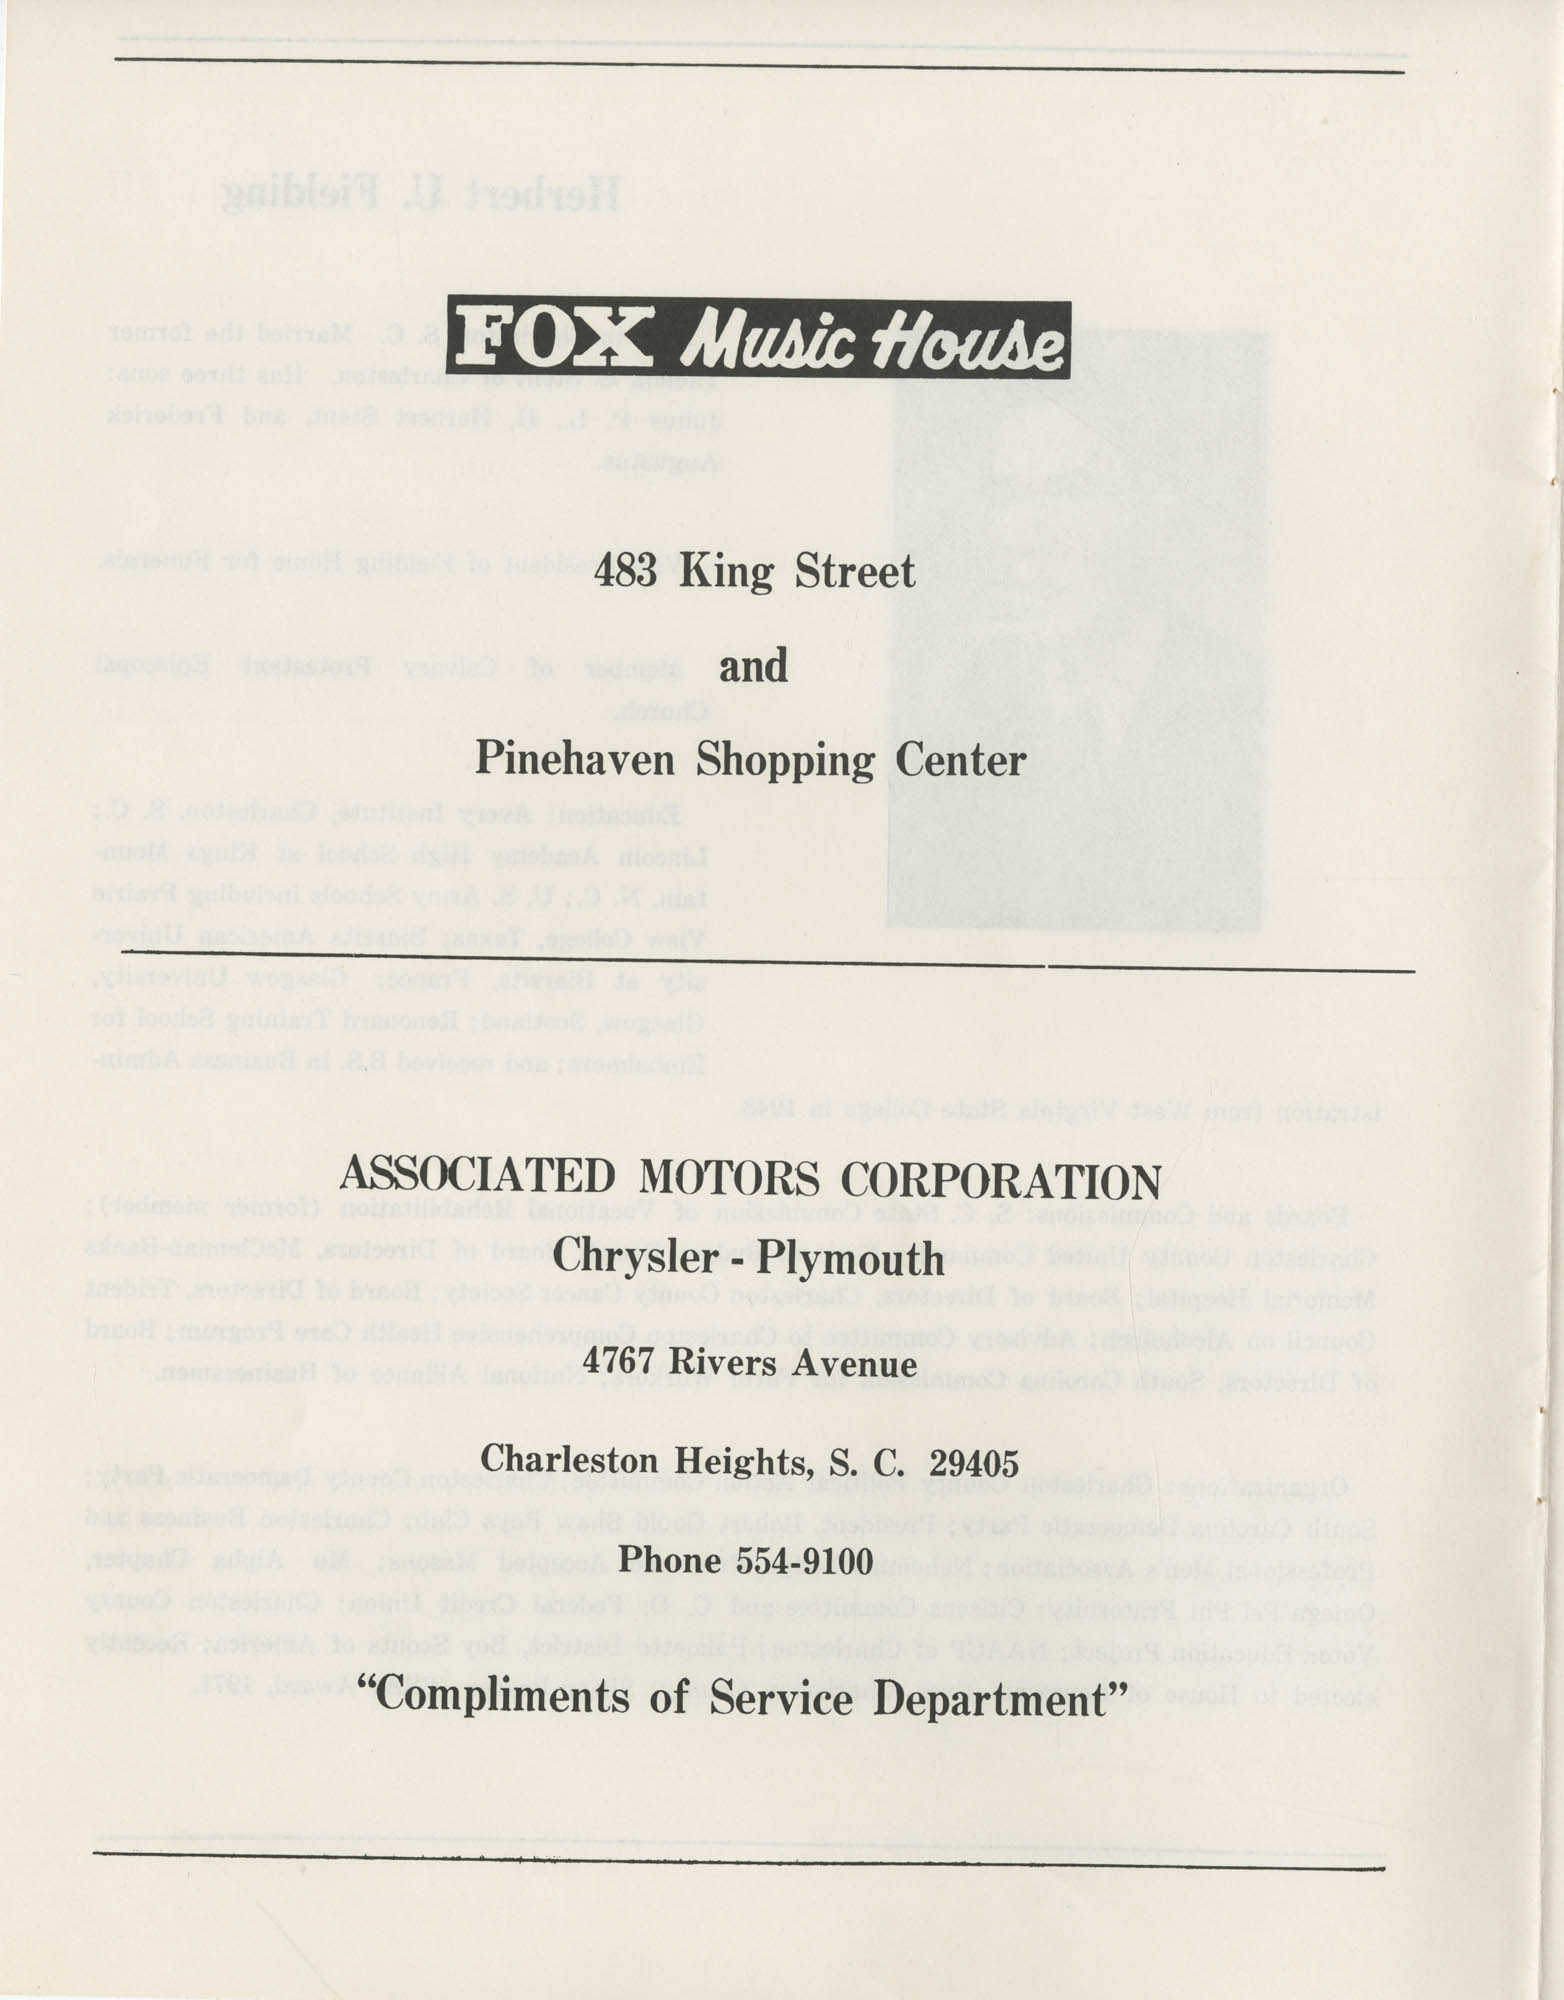 1972 Appreciation Dinner Program, Page 2